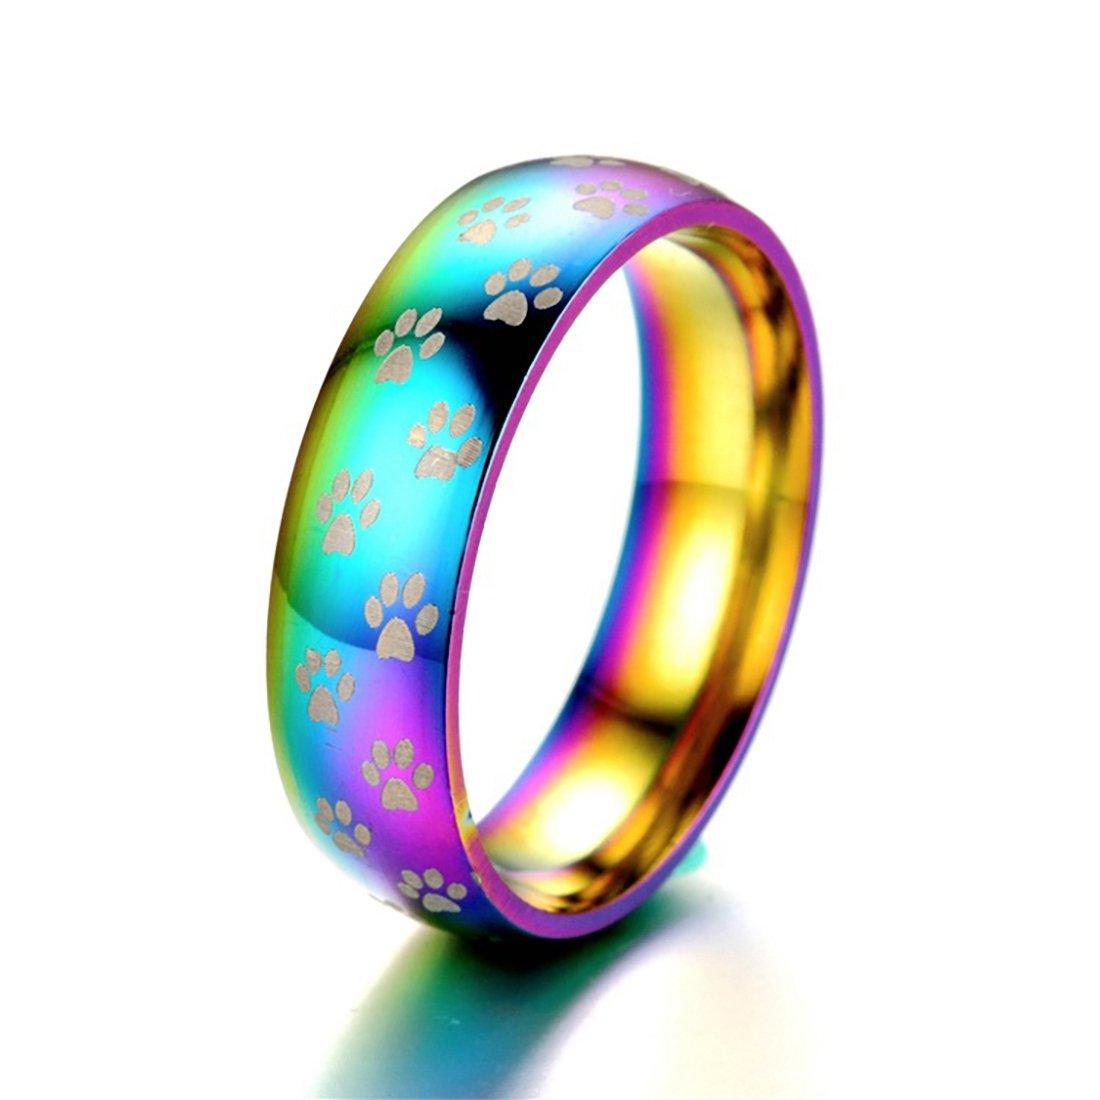 Men's Women's 8mm Fashion Stainless Steel Ring LGBT True Love Rings Size 5